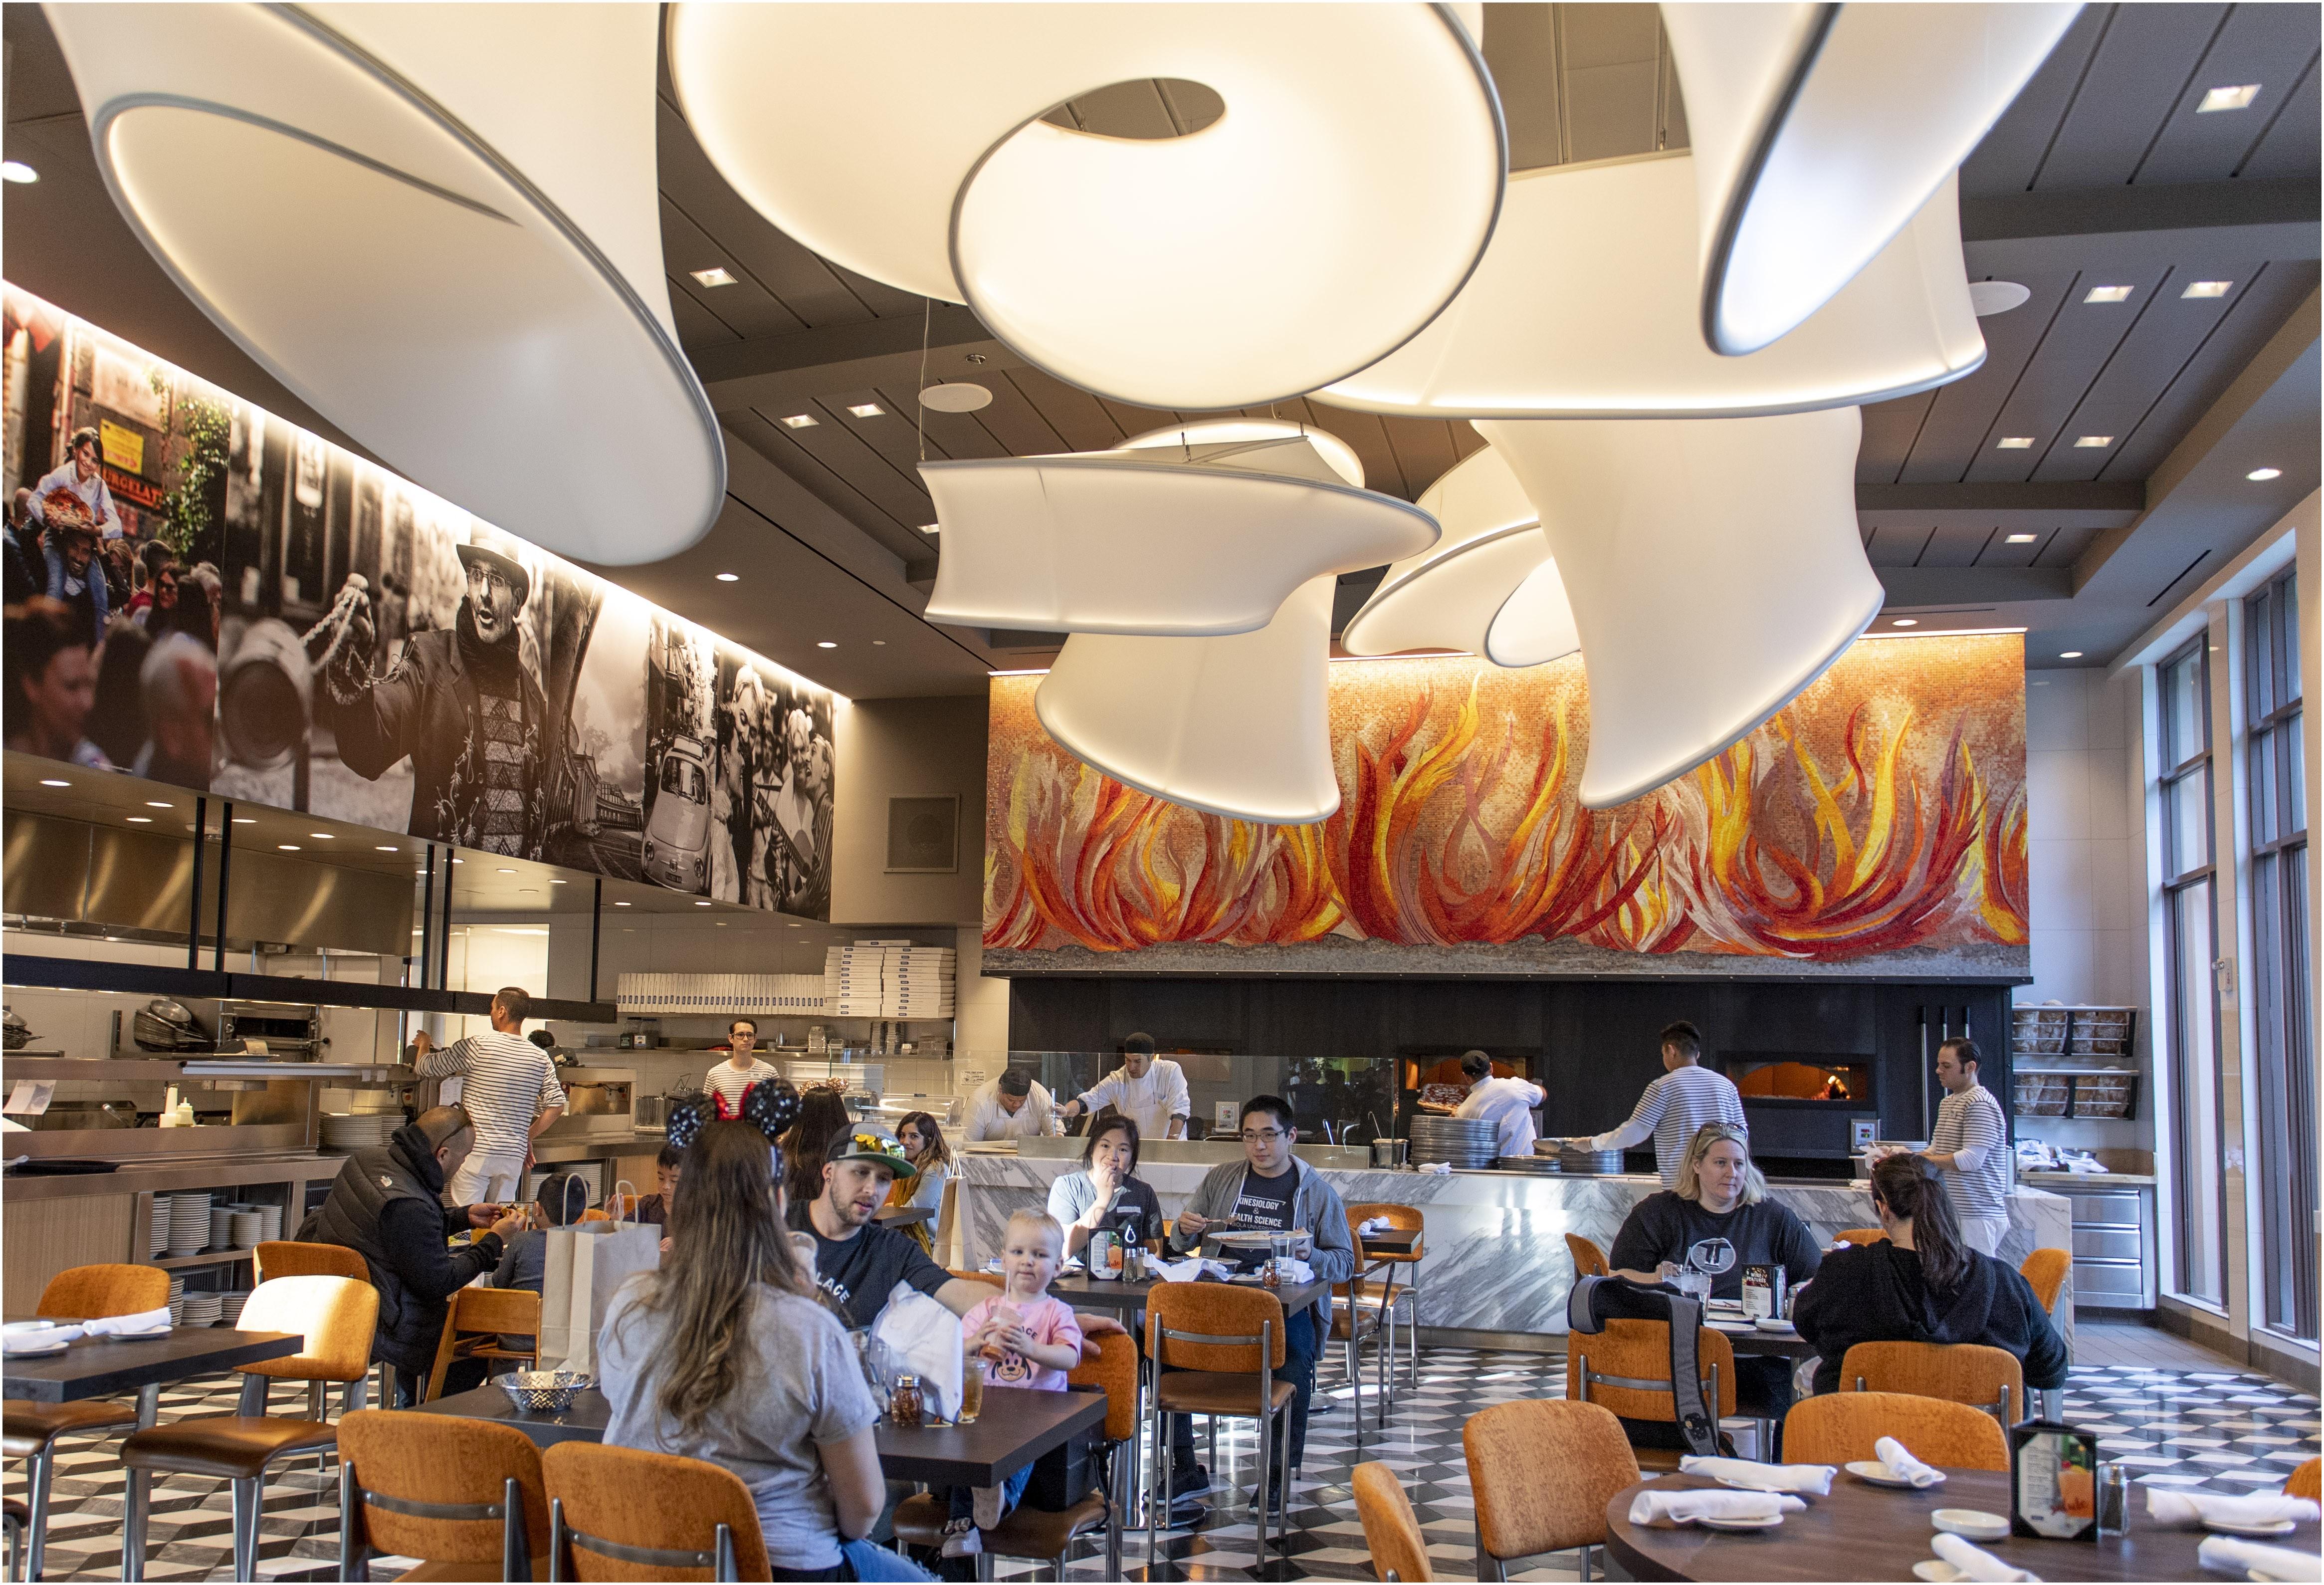 Top Italian Restaurants Newport Beach Luxury First Look Naples Ristorante E Bar In Downtown Disney Unveils